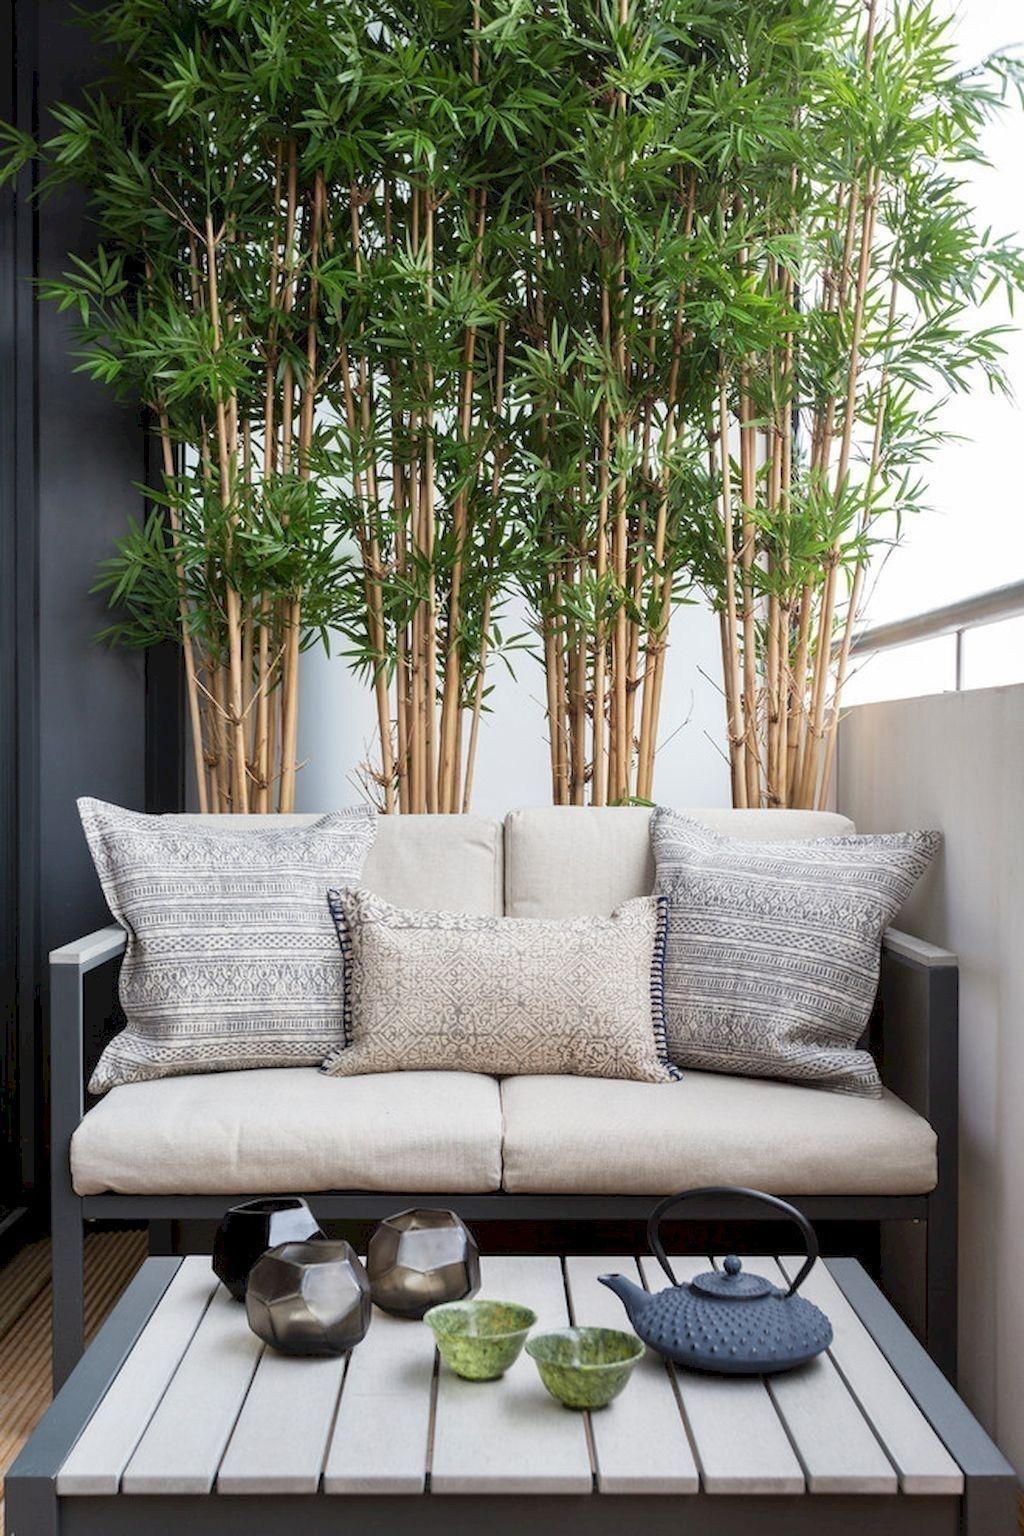 Trendy apartment balcony decoration ideas 15 patios for Idea deco plantas terraza